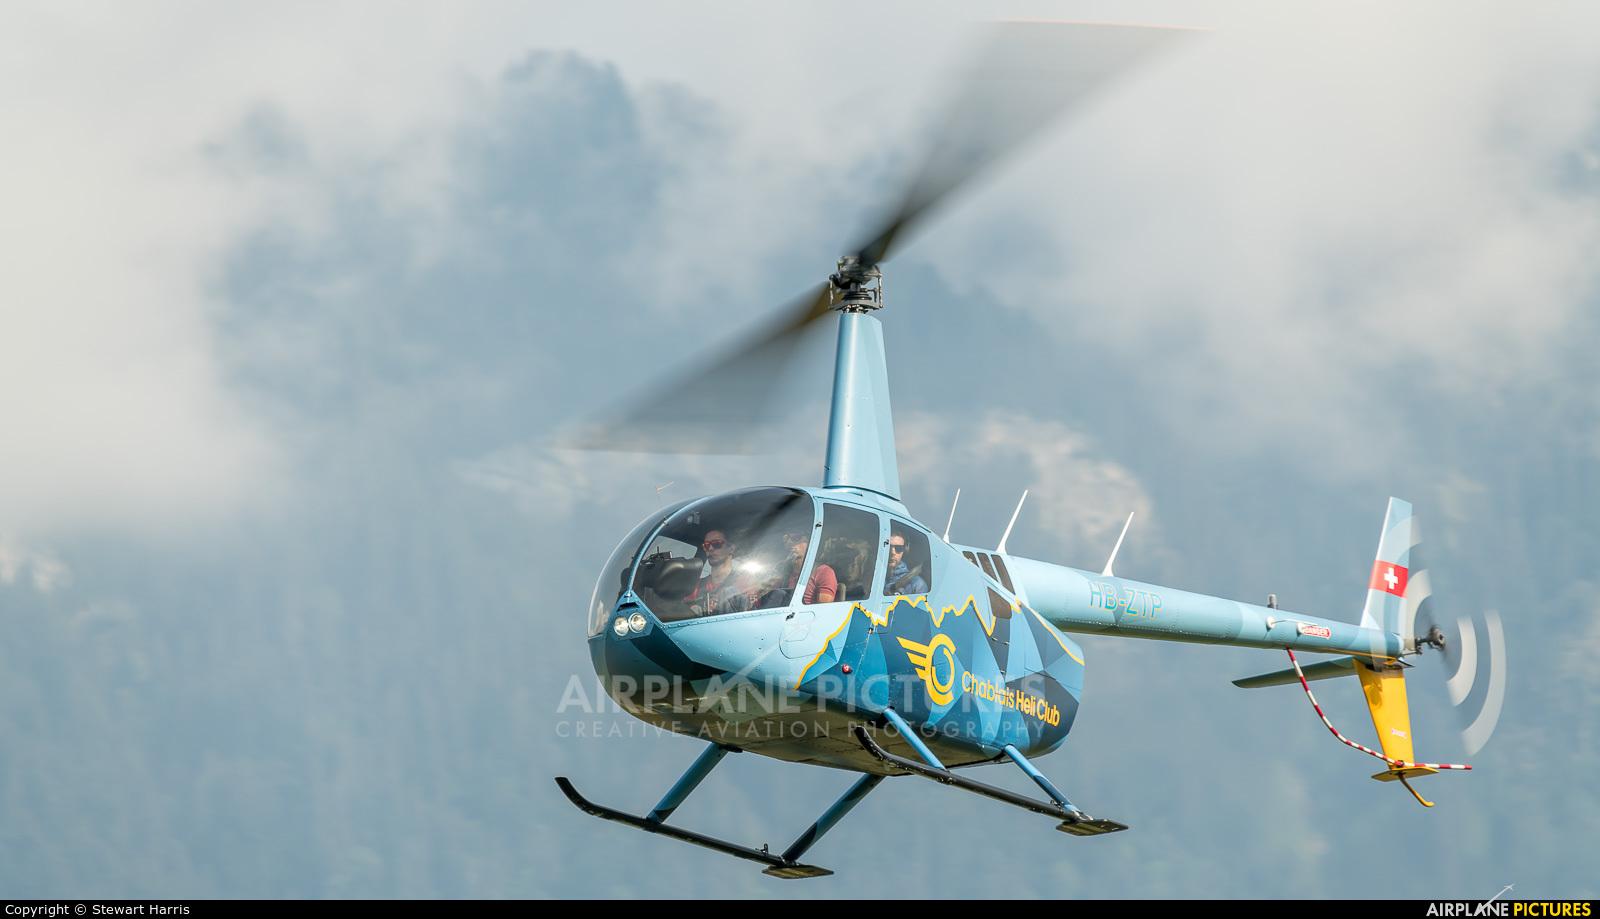 Chablais Heli Club HB-ZTP aircraft at Bex